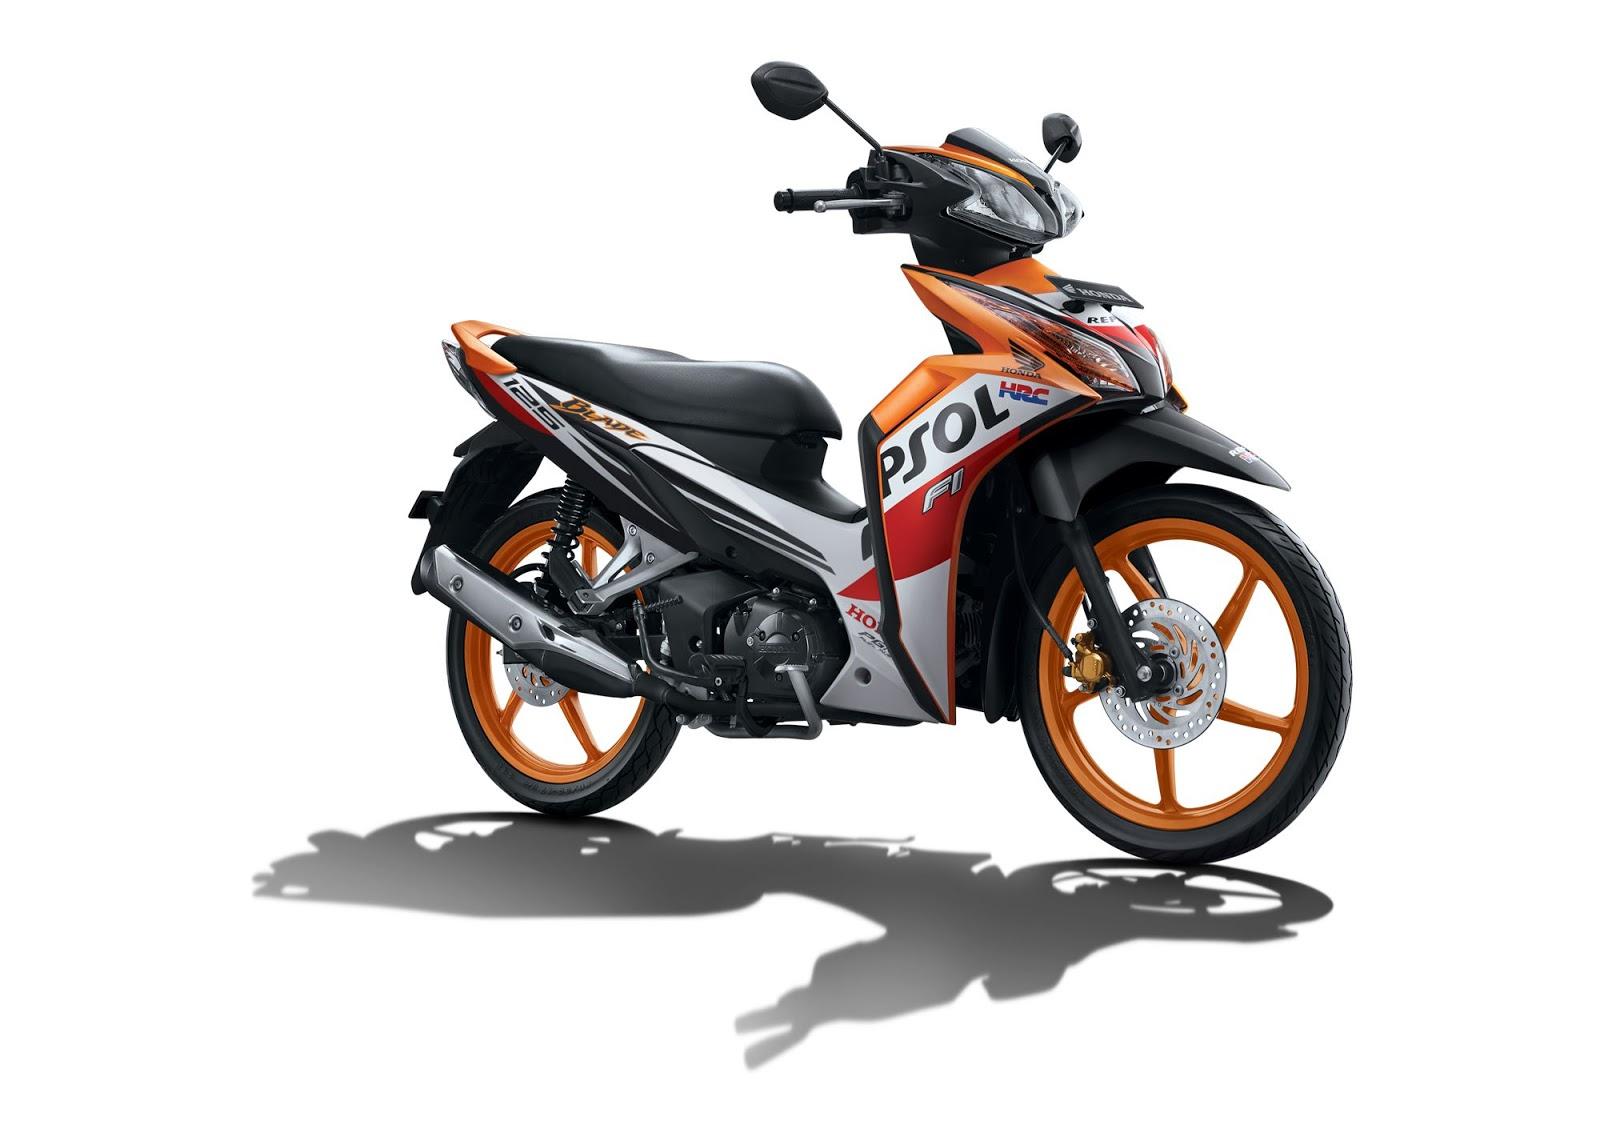 Harga dan Spesifikasi Motor Honda Blade 125 FI Terbaru 2018